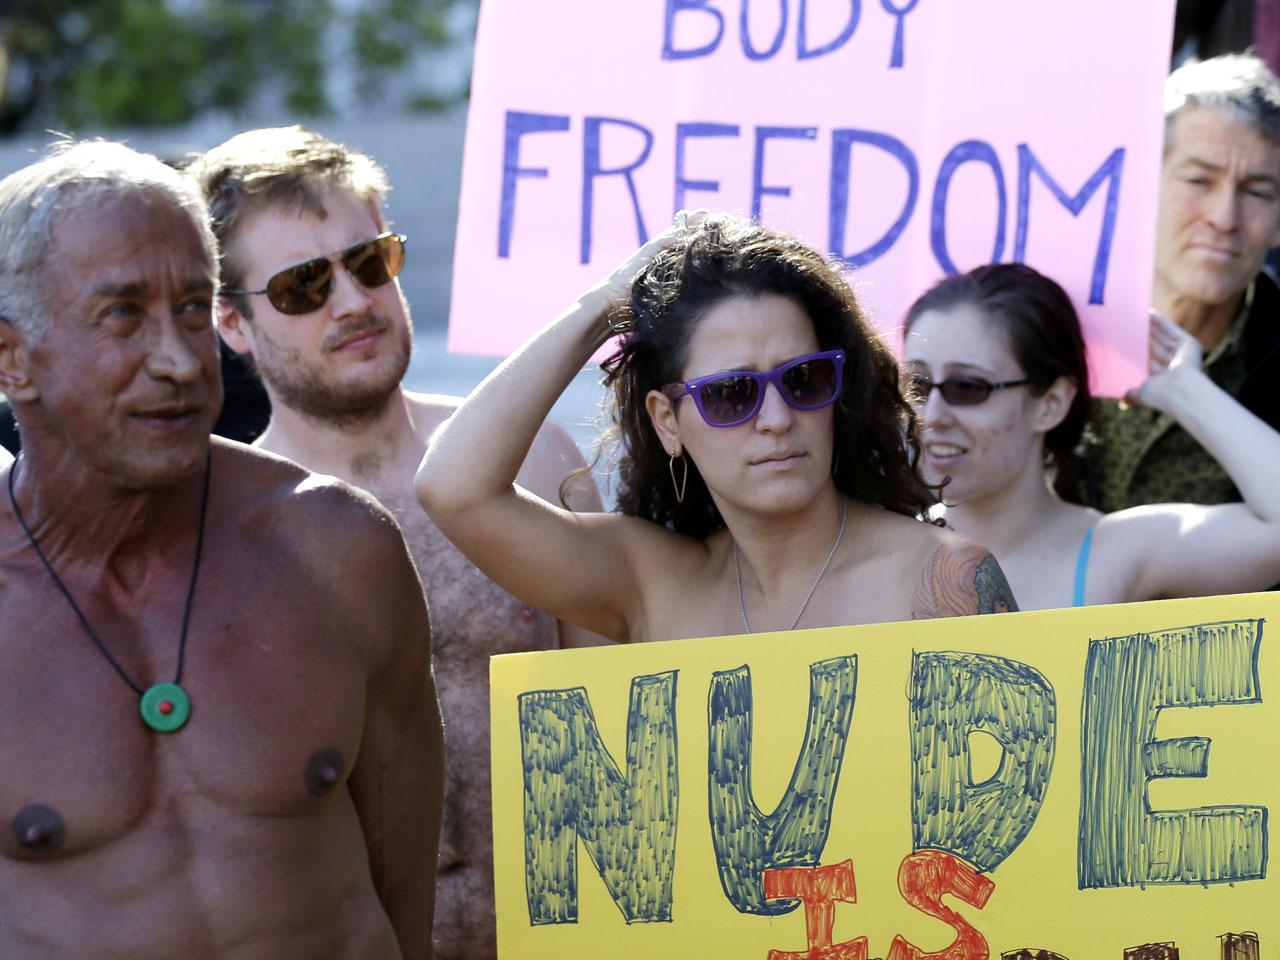 Nudist families in public